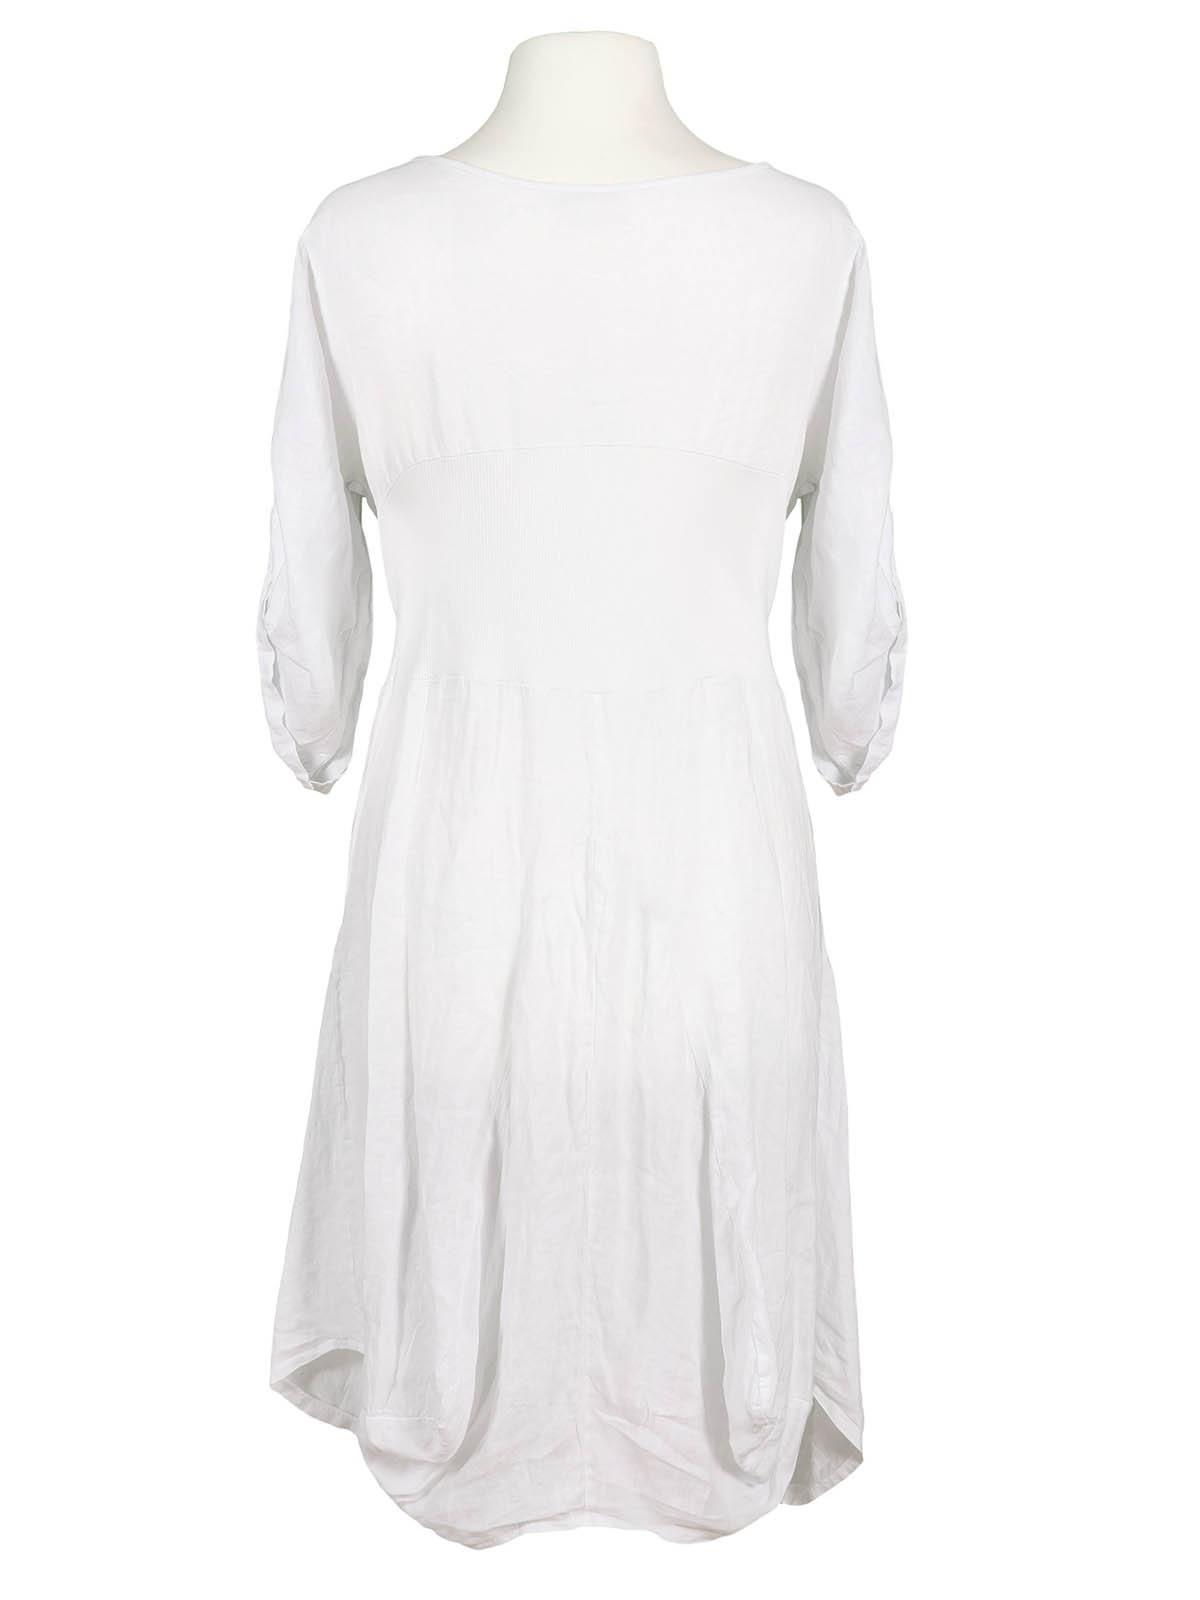 13 Spektakulär Kleid A Form Boutique10 Perfekt Kleid A Form Ärmel